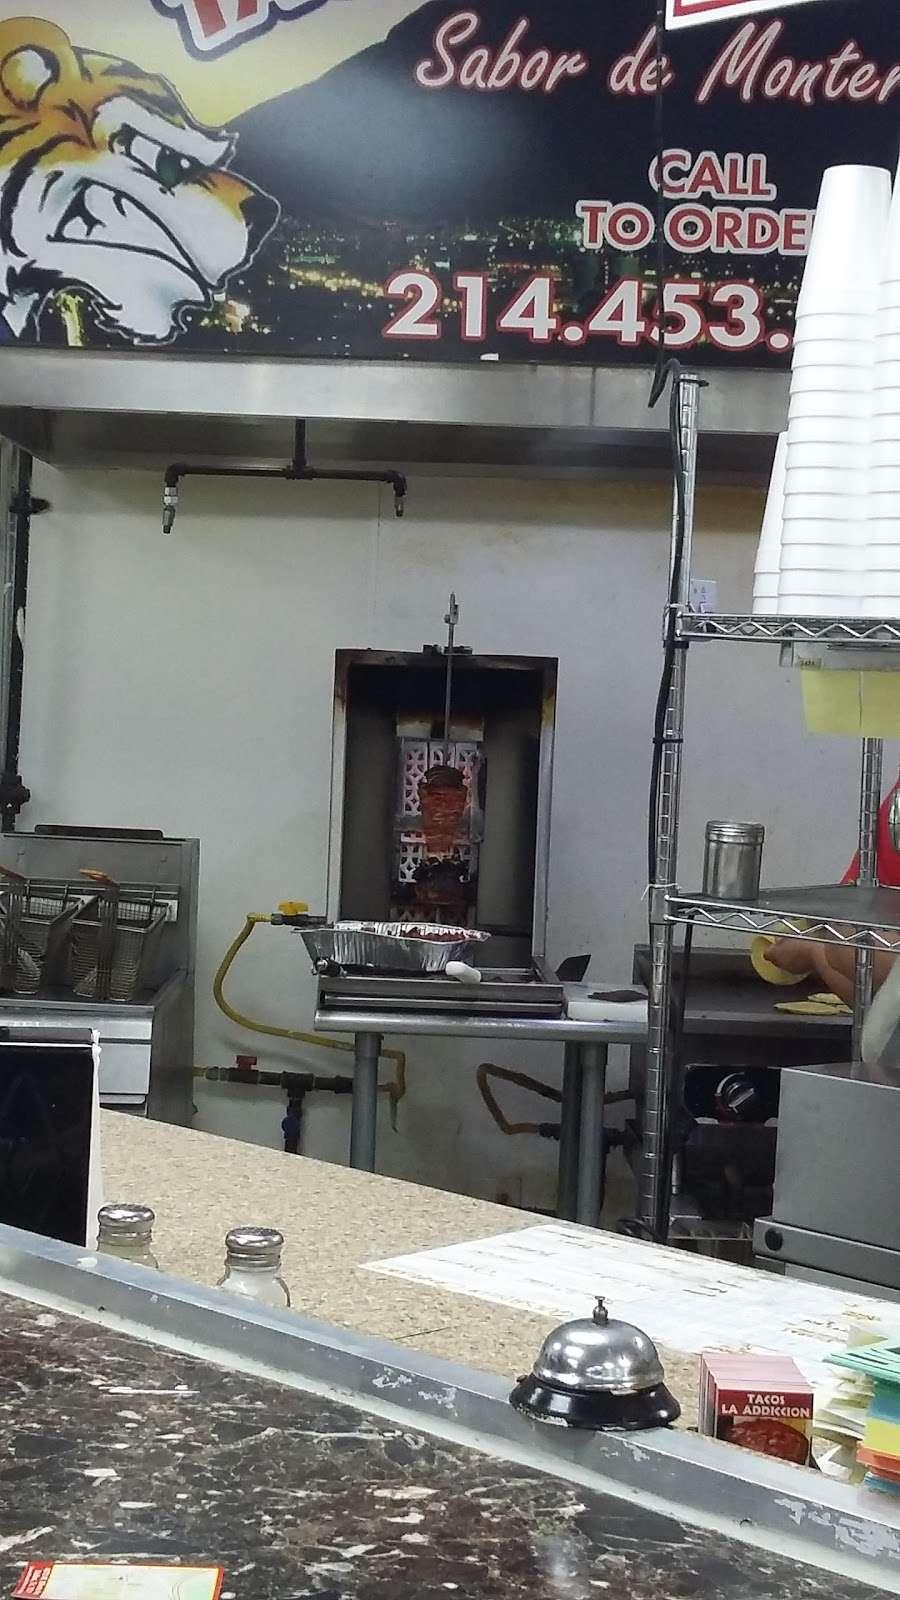 Tacos La Addiccion - restaurant  | Photo 4 of 10 | Address: 4970 W Illinois Ave, Dallas, TX 75211, USA | Phone: (214) 453-1580